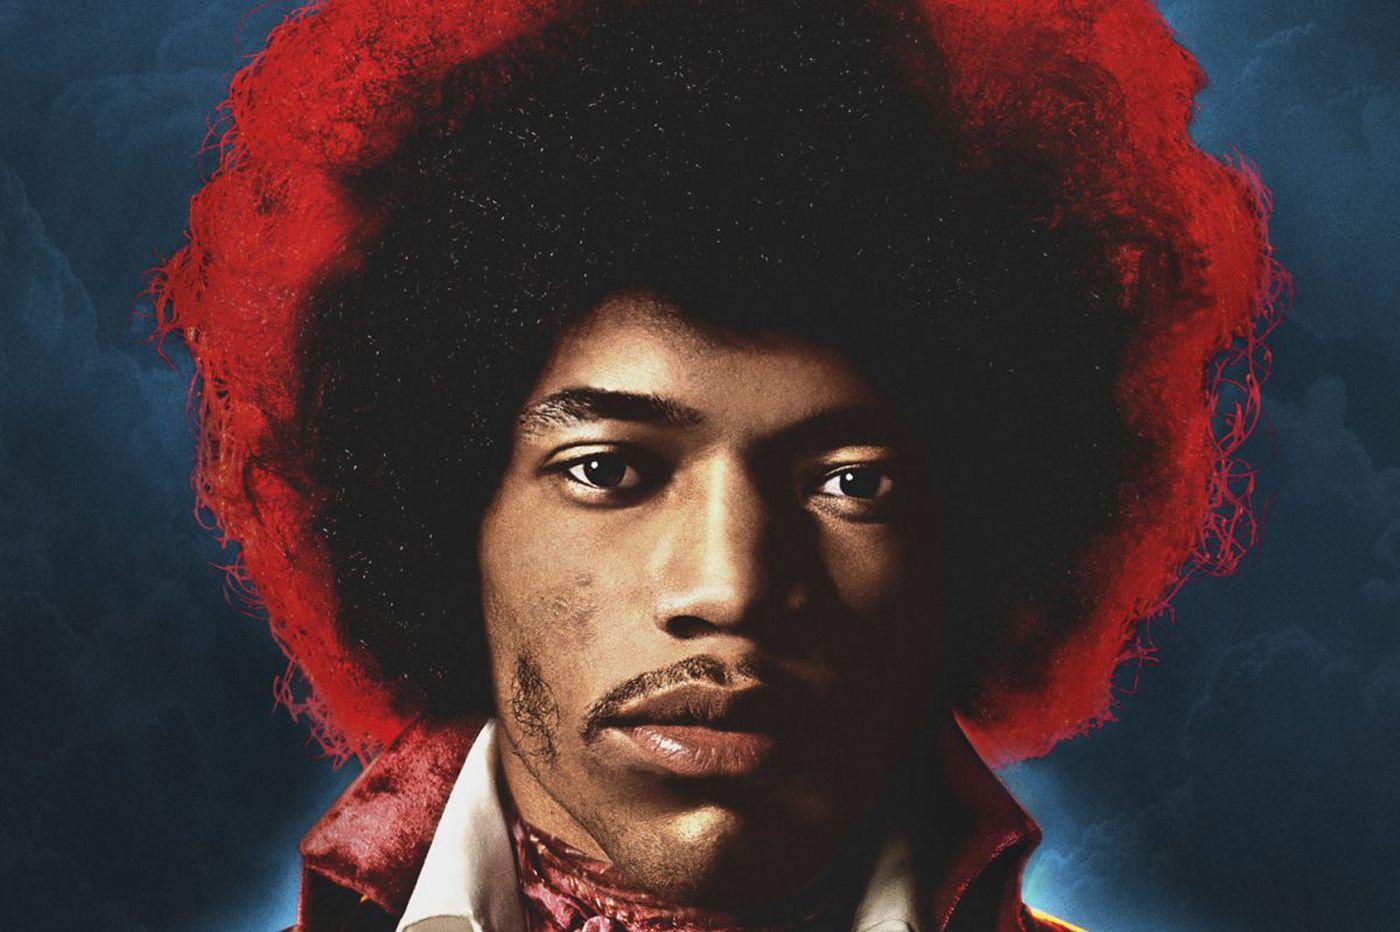 Album reviews: Jimi Hendrix, Hayley Heynderickx and August Greene